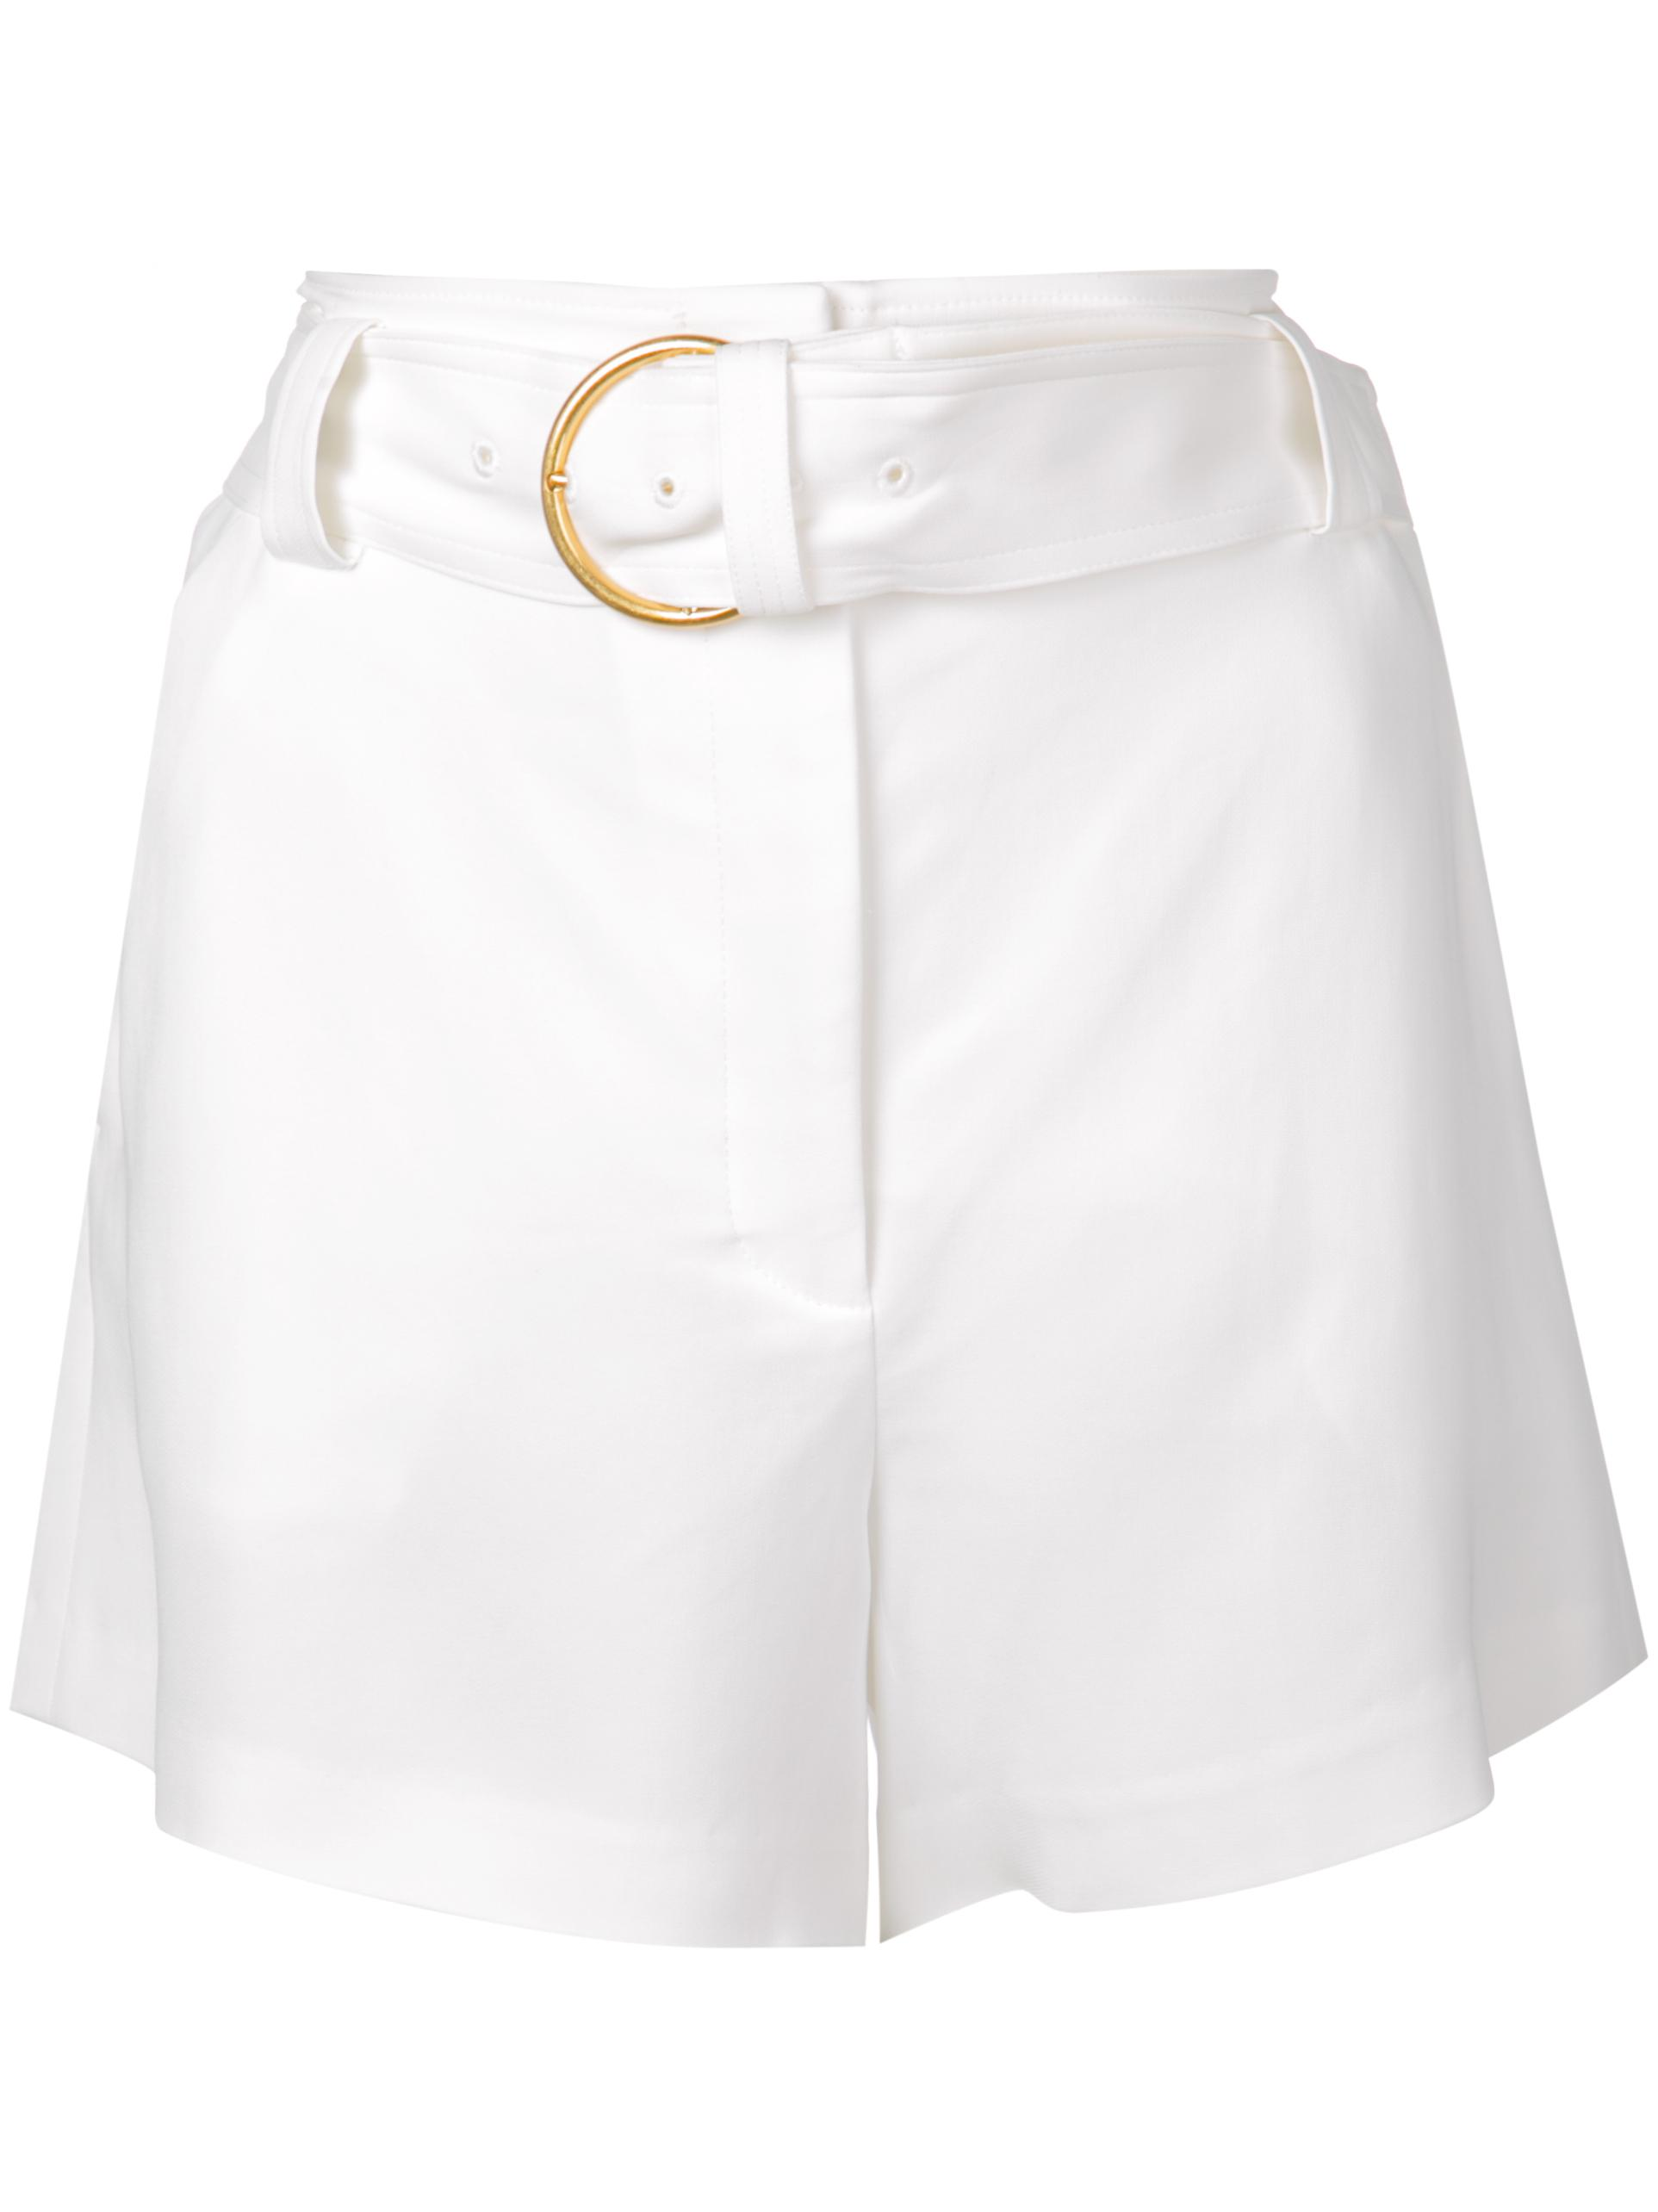 Clive O- Ring Belt High Waist Short Item # 2PANT00307